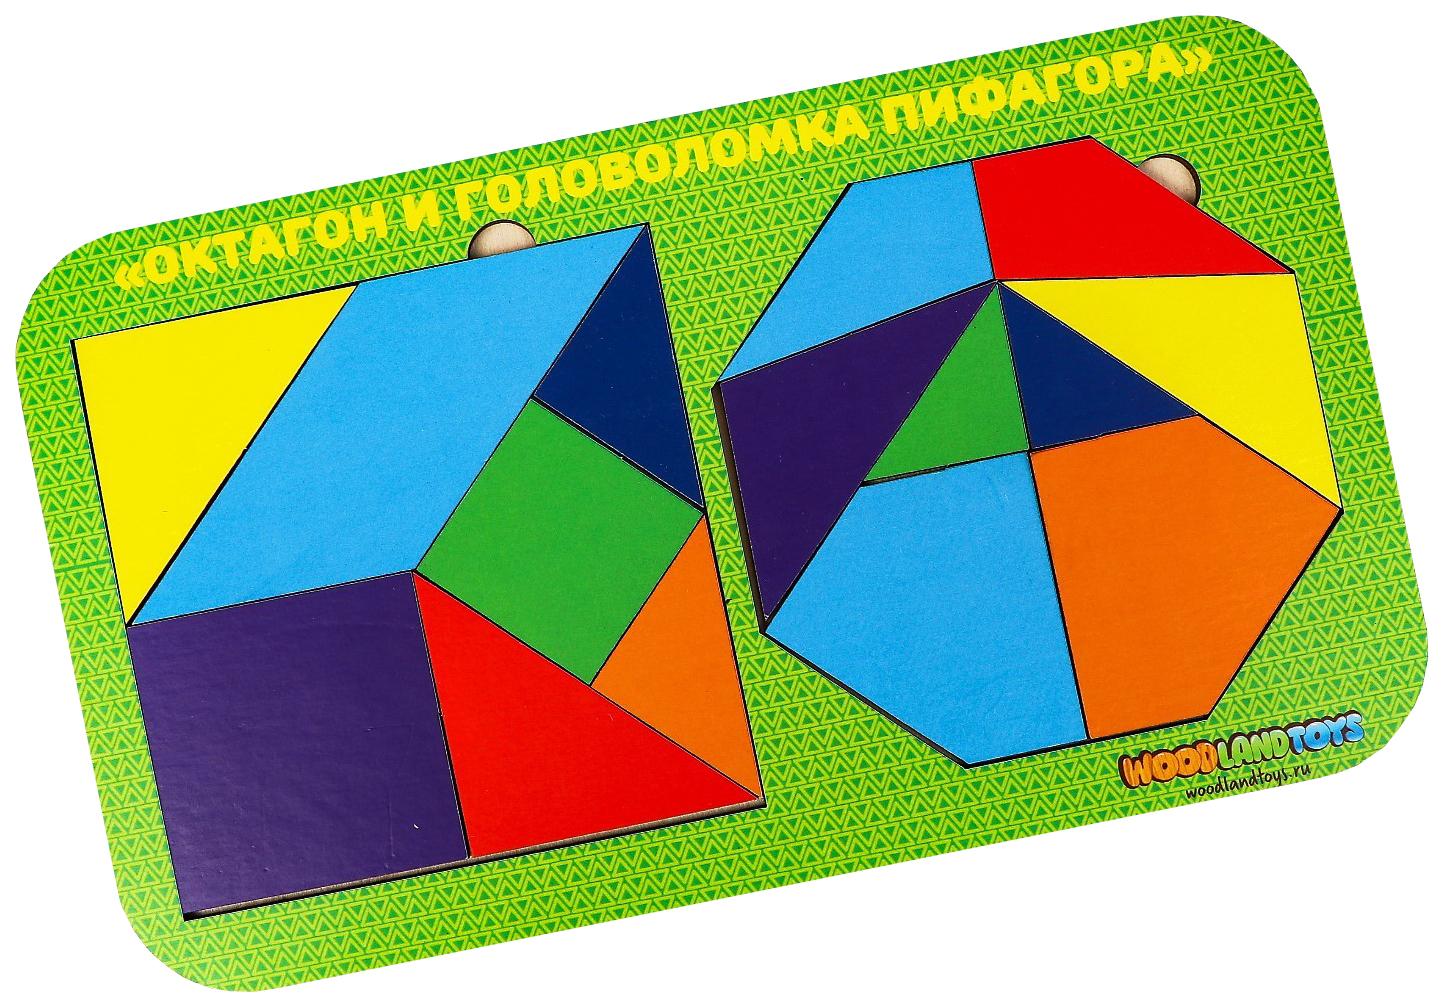 Набор головоломок 2.0 Октагон и головоломка Пифагора,